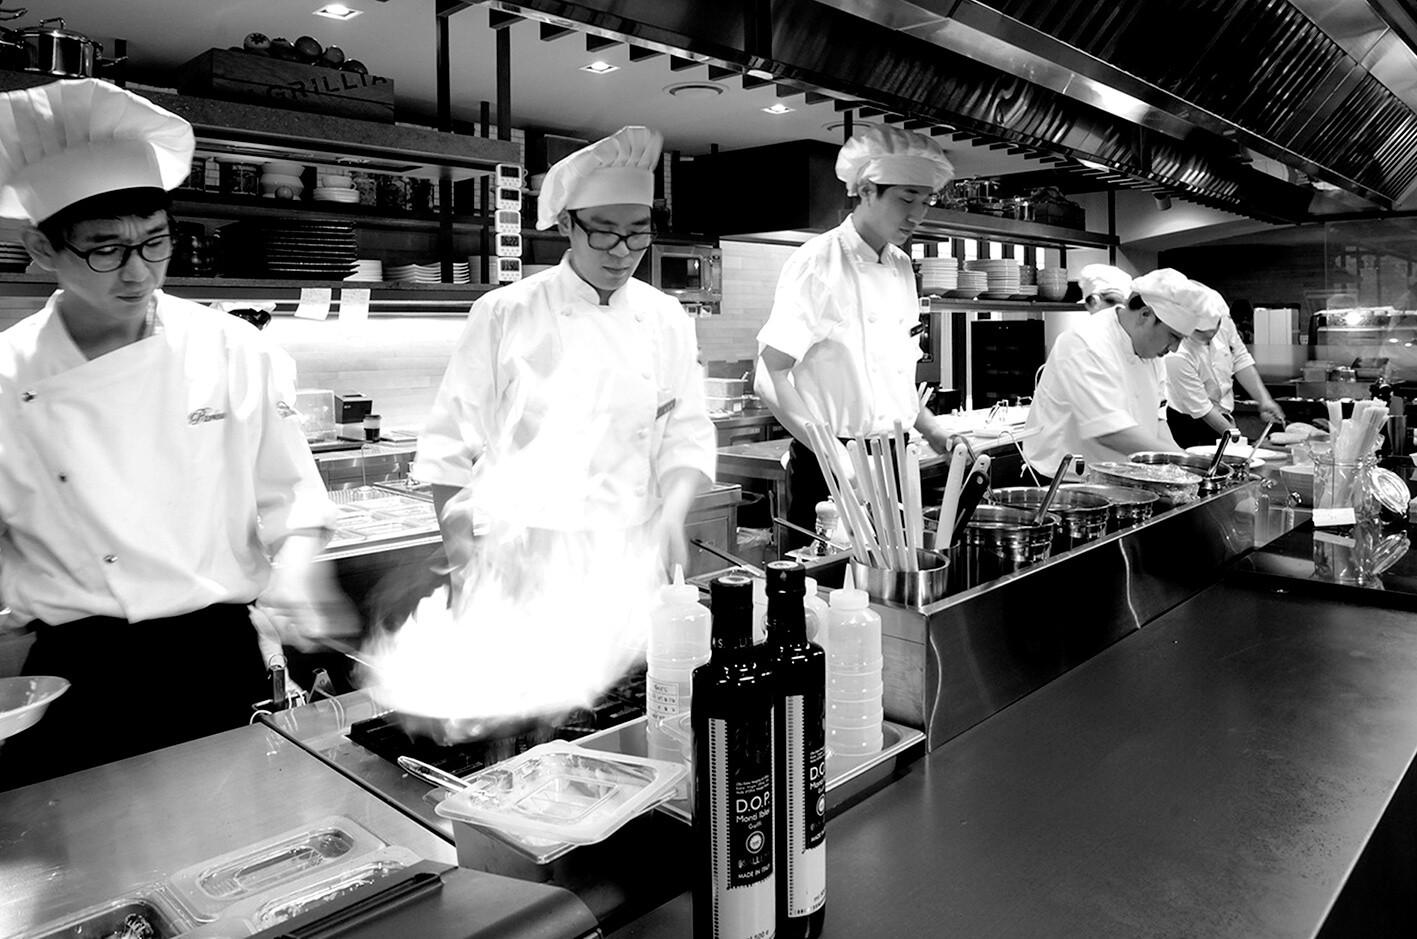 Spc Sqaure Open Kitchen.jpg